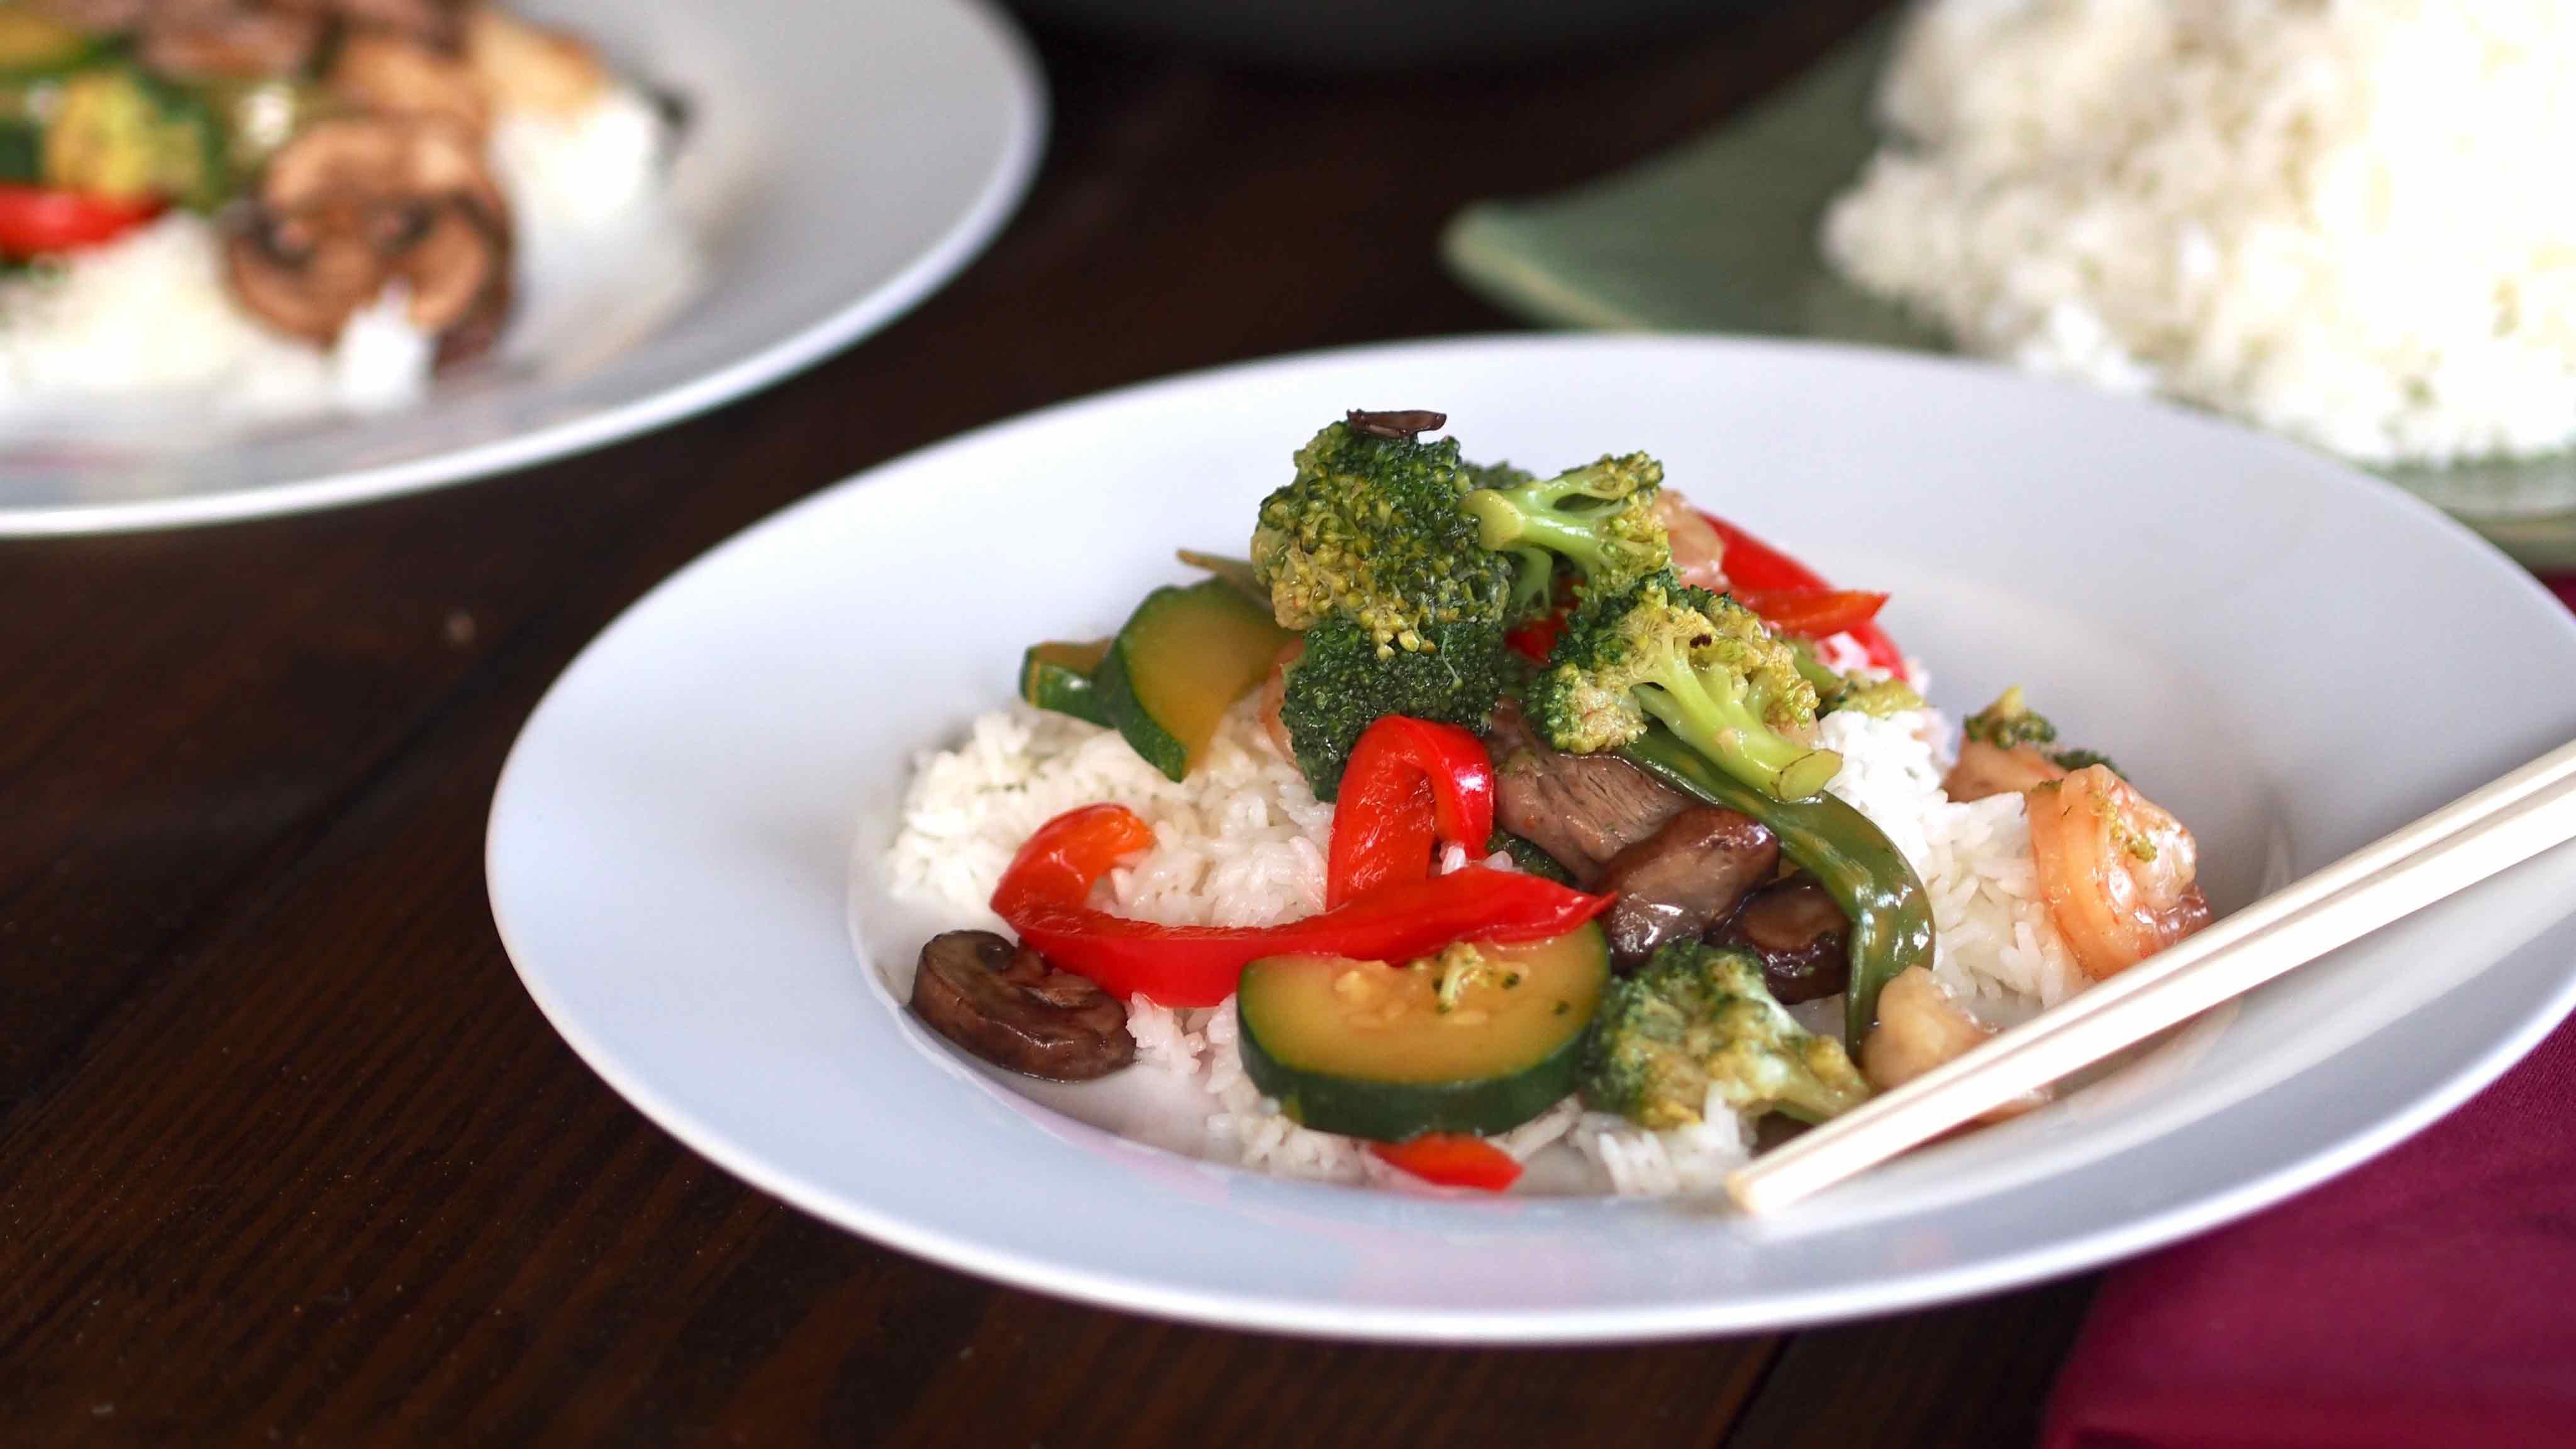 Image for Recipe Surf 'n Turf Veggie Stir Fry